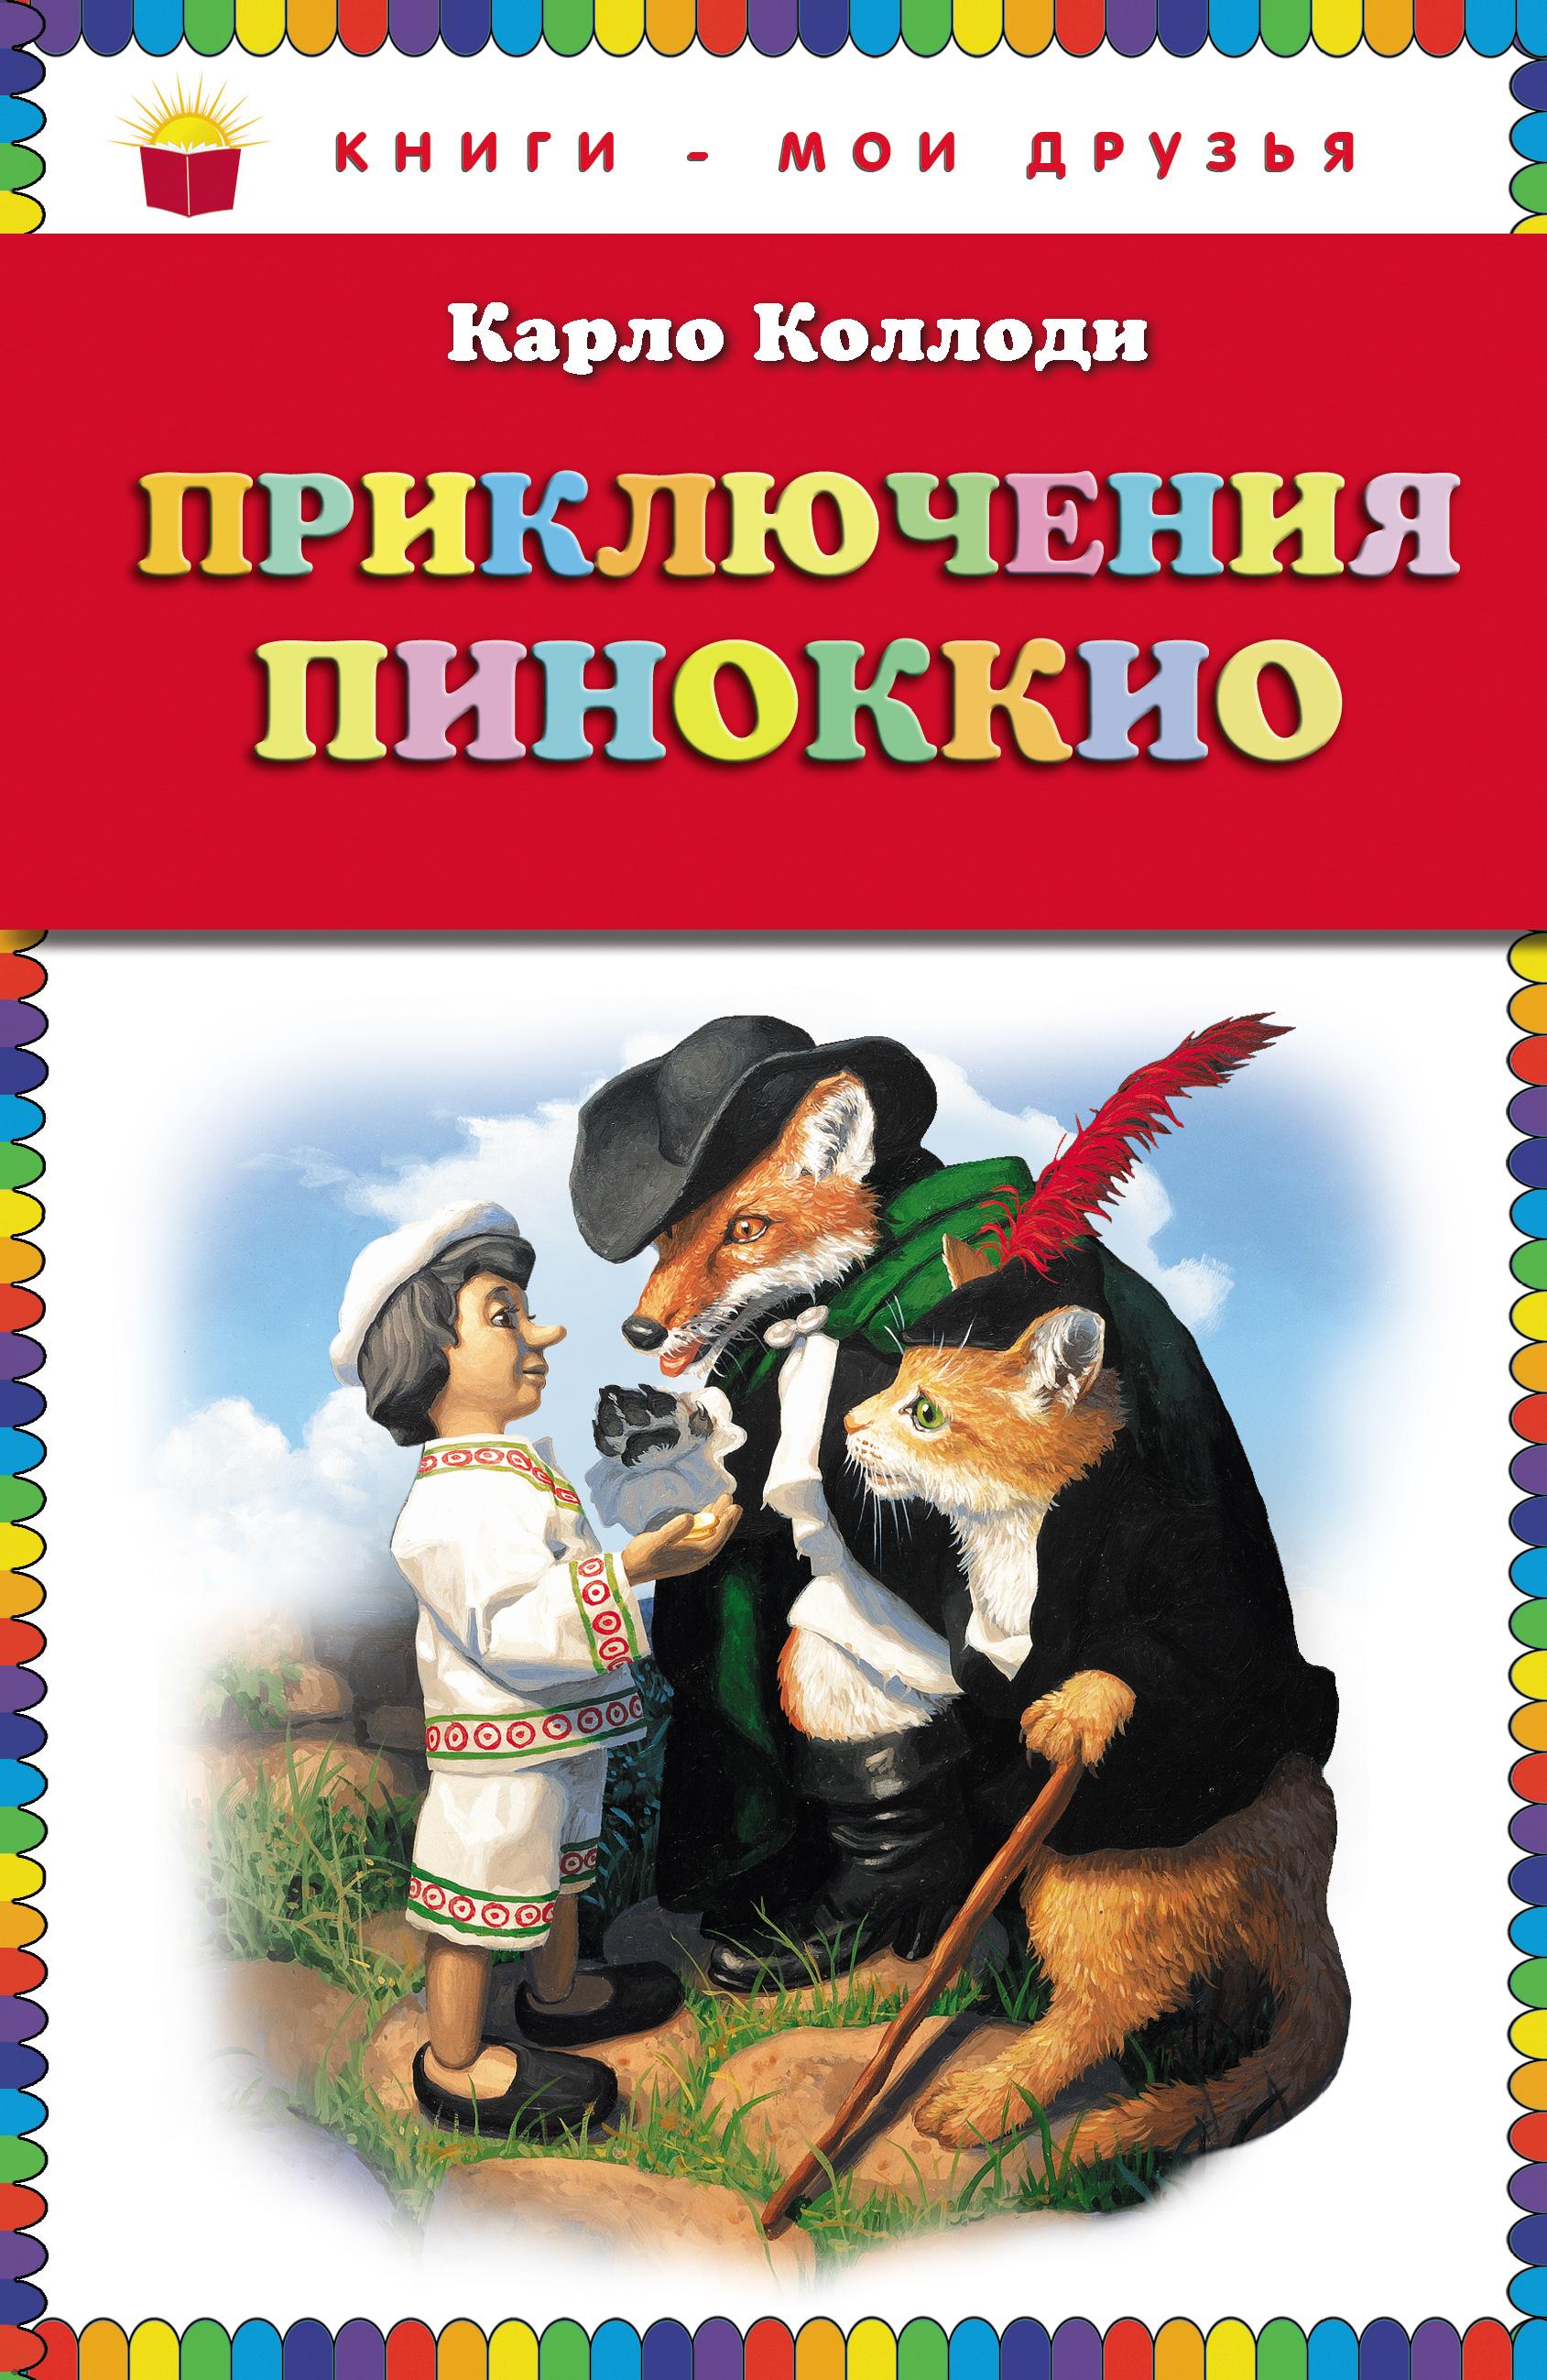 Книга Приключения Пиноккио